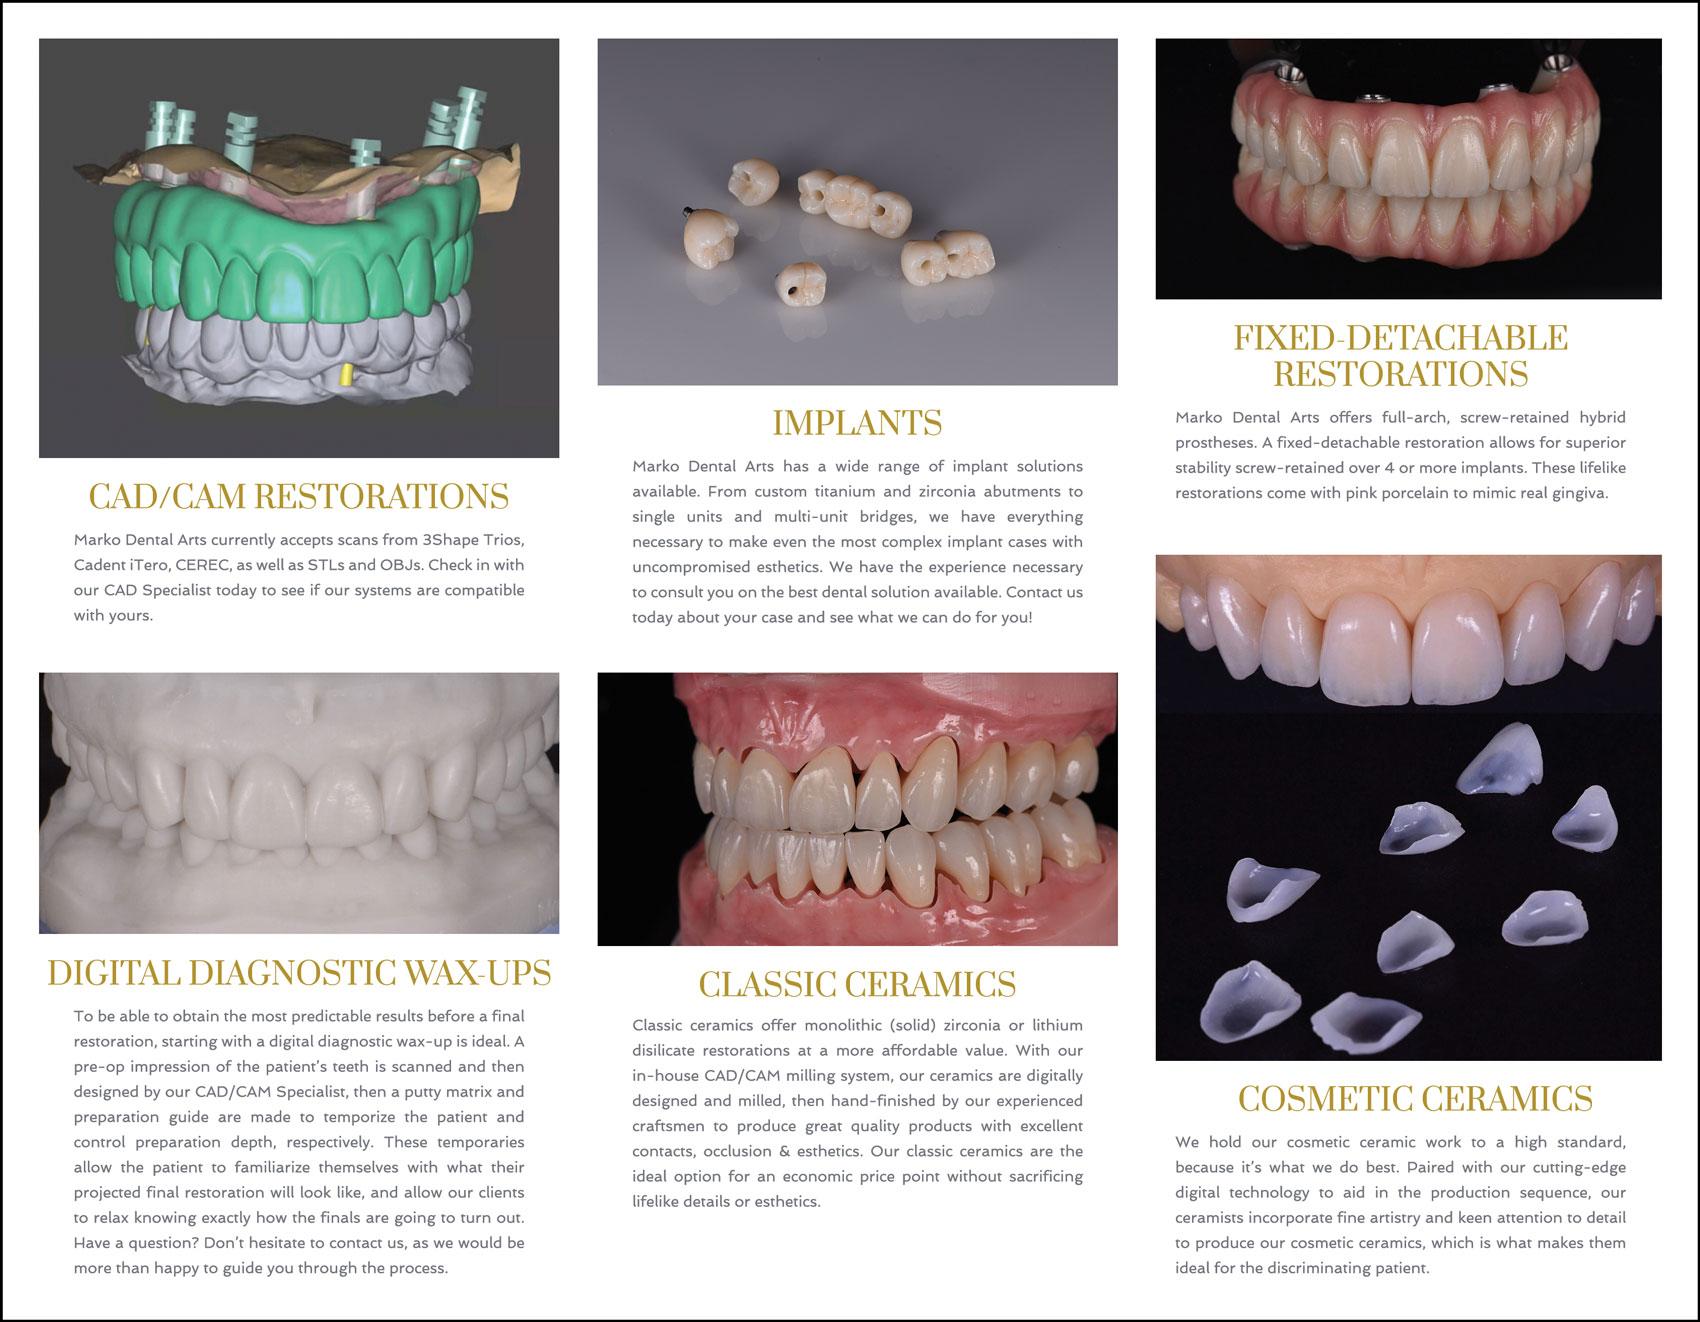 Inside panel Marko Dental Arts